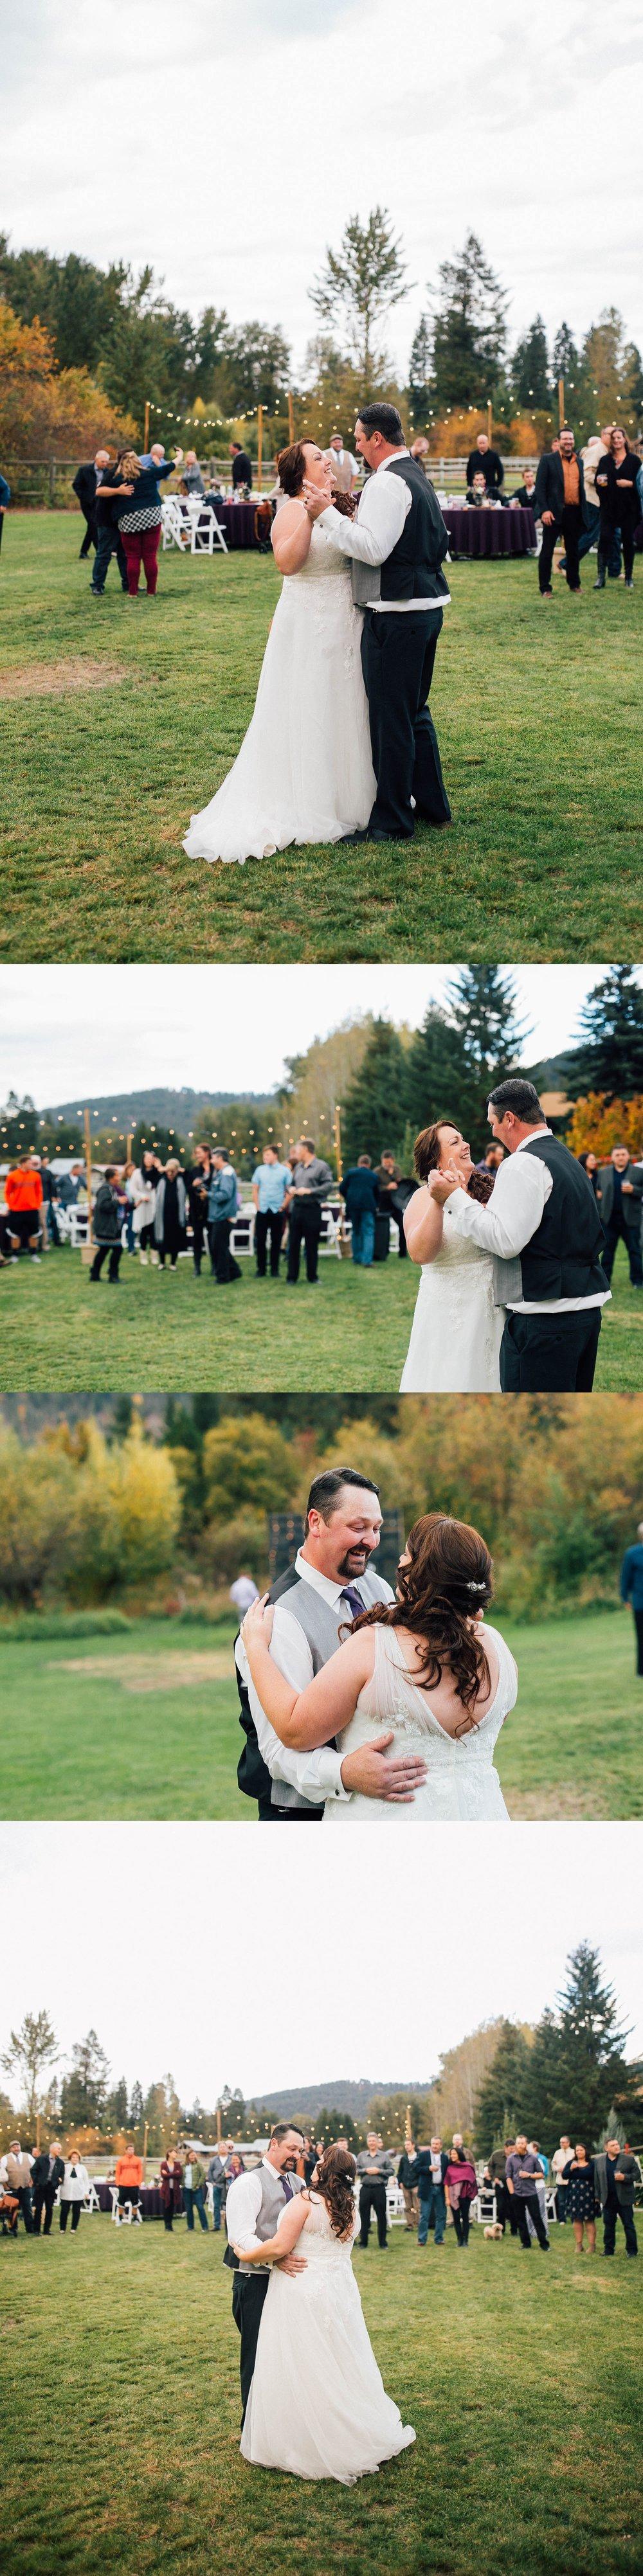 ashley_vos_seattle_ wedding_photographer_0240.jpg